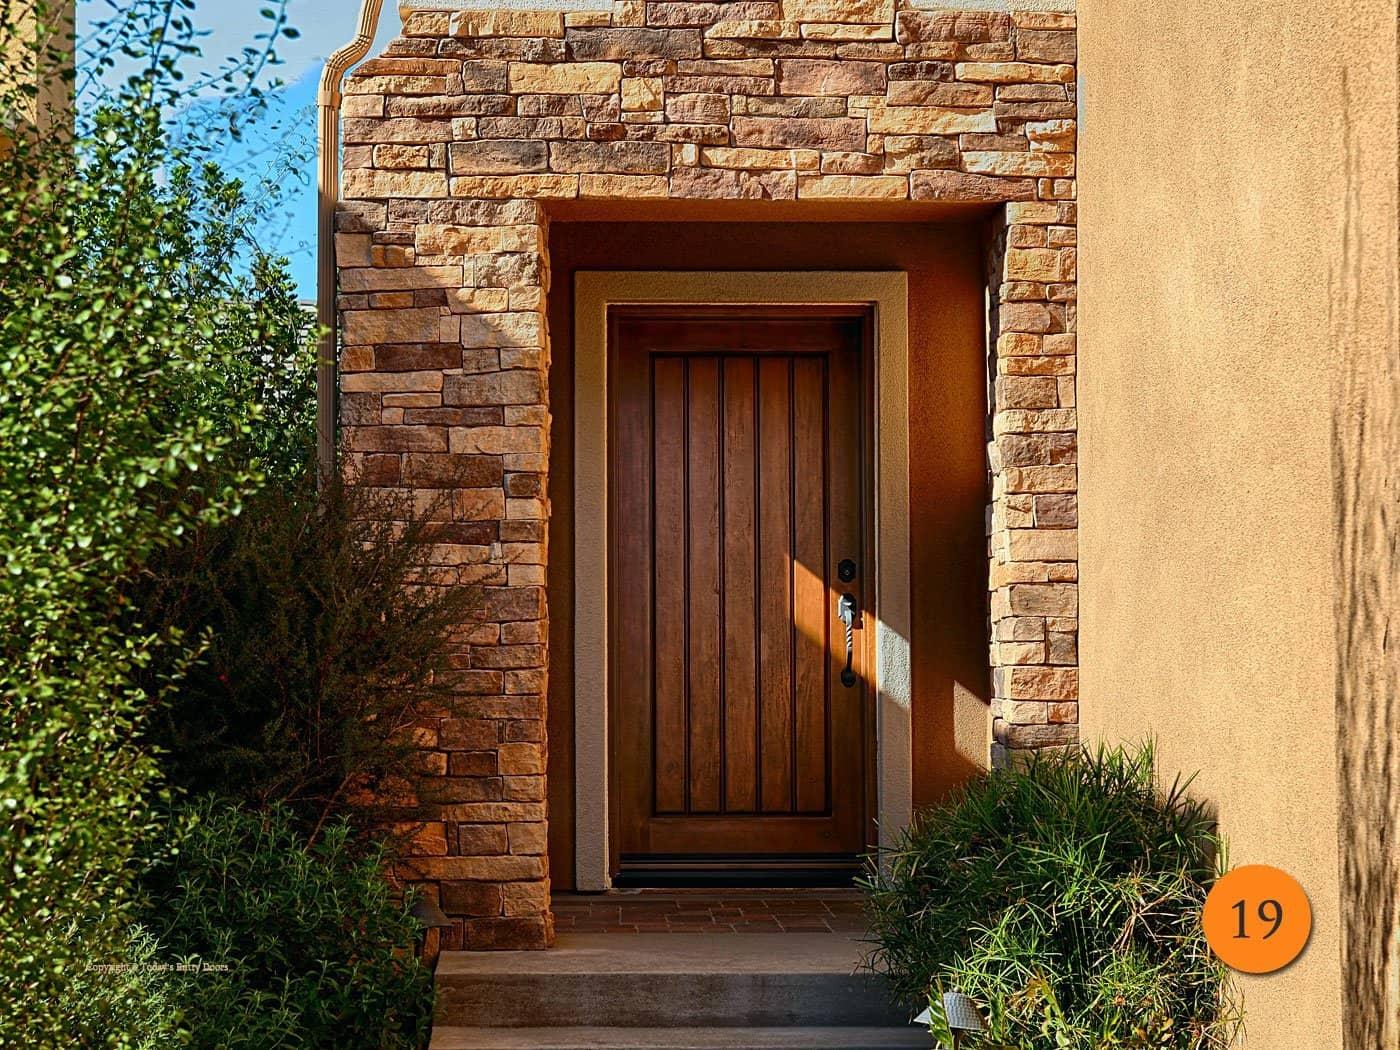 charming rustic entry door